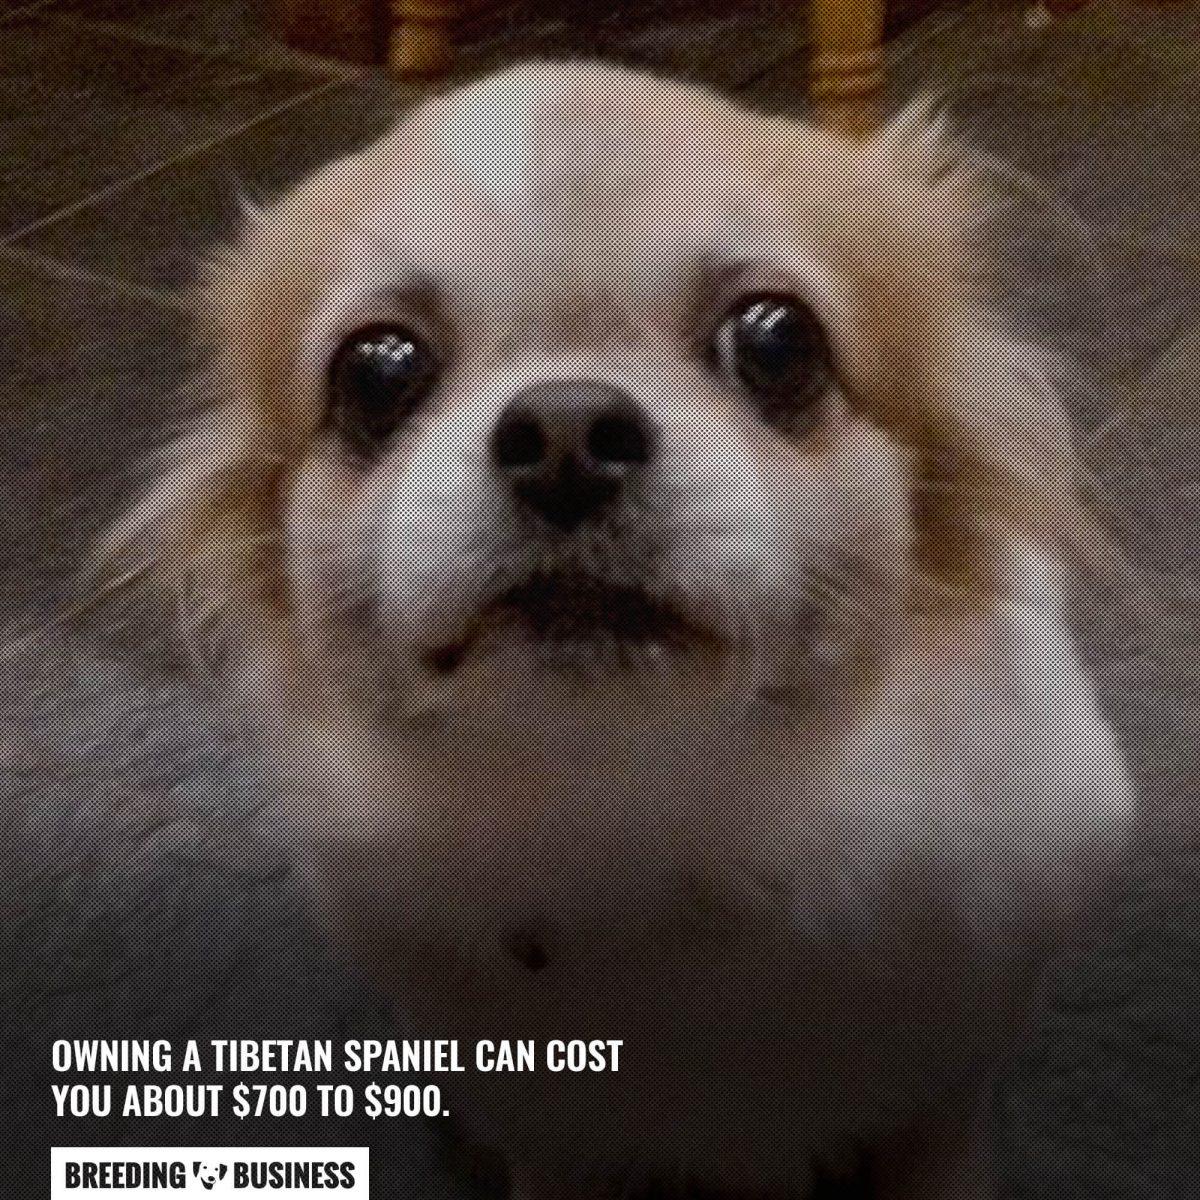 cost of tibetan spaniels